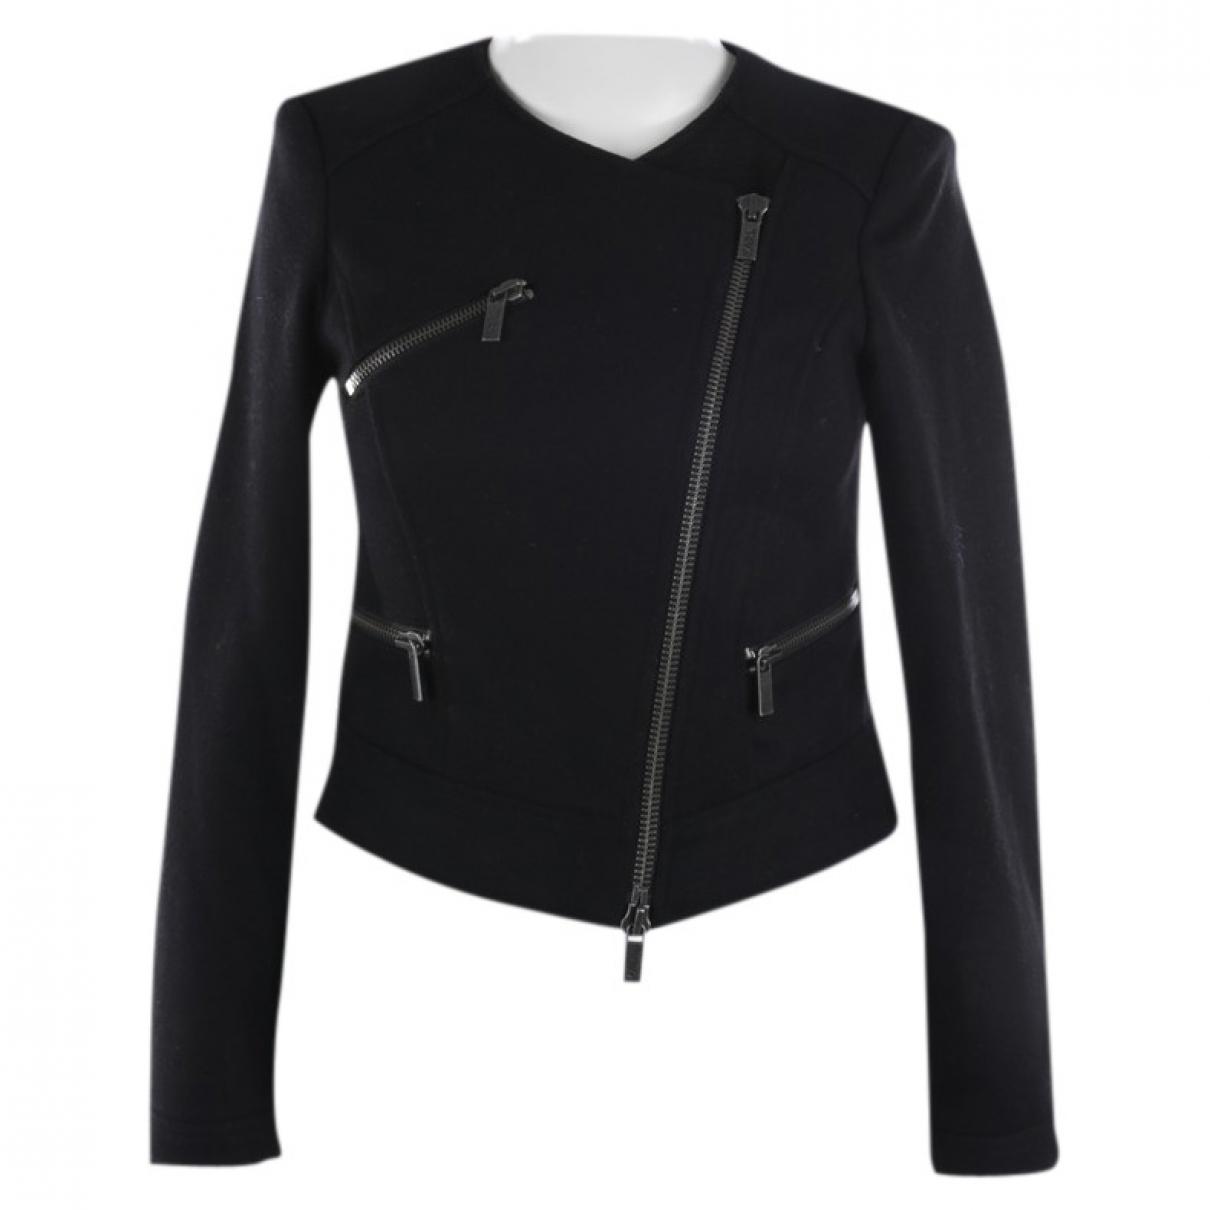 Karl Lagerfeld - Veste   pour femme en laine - noir